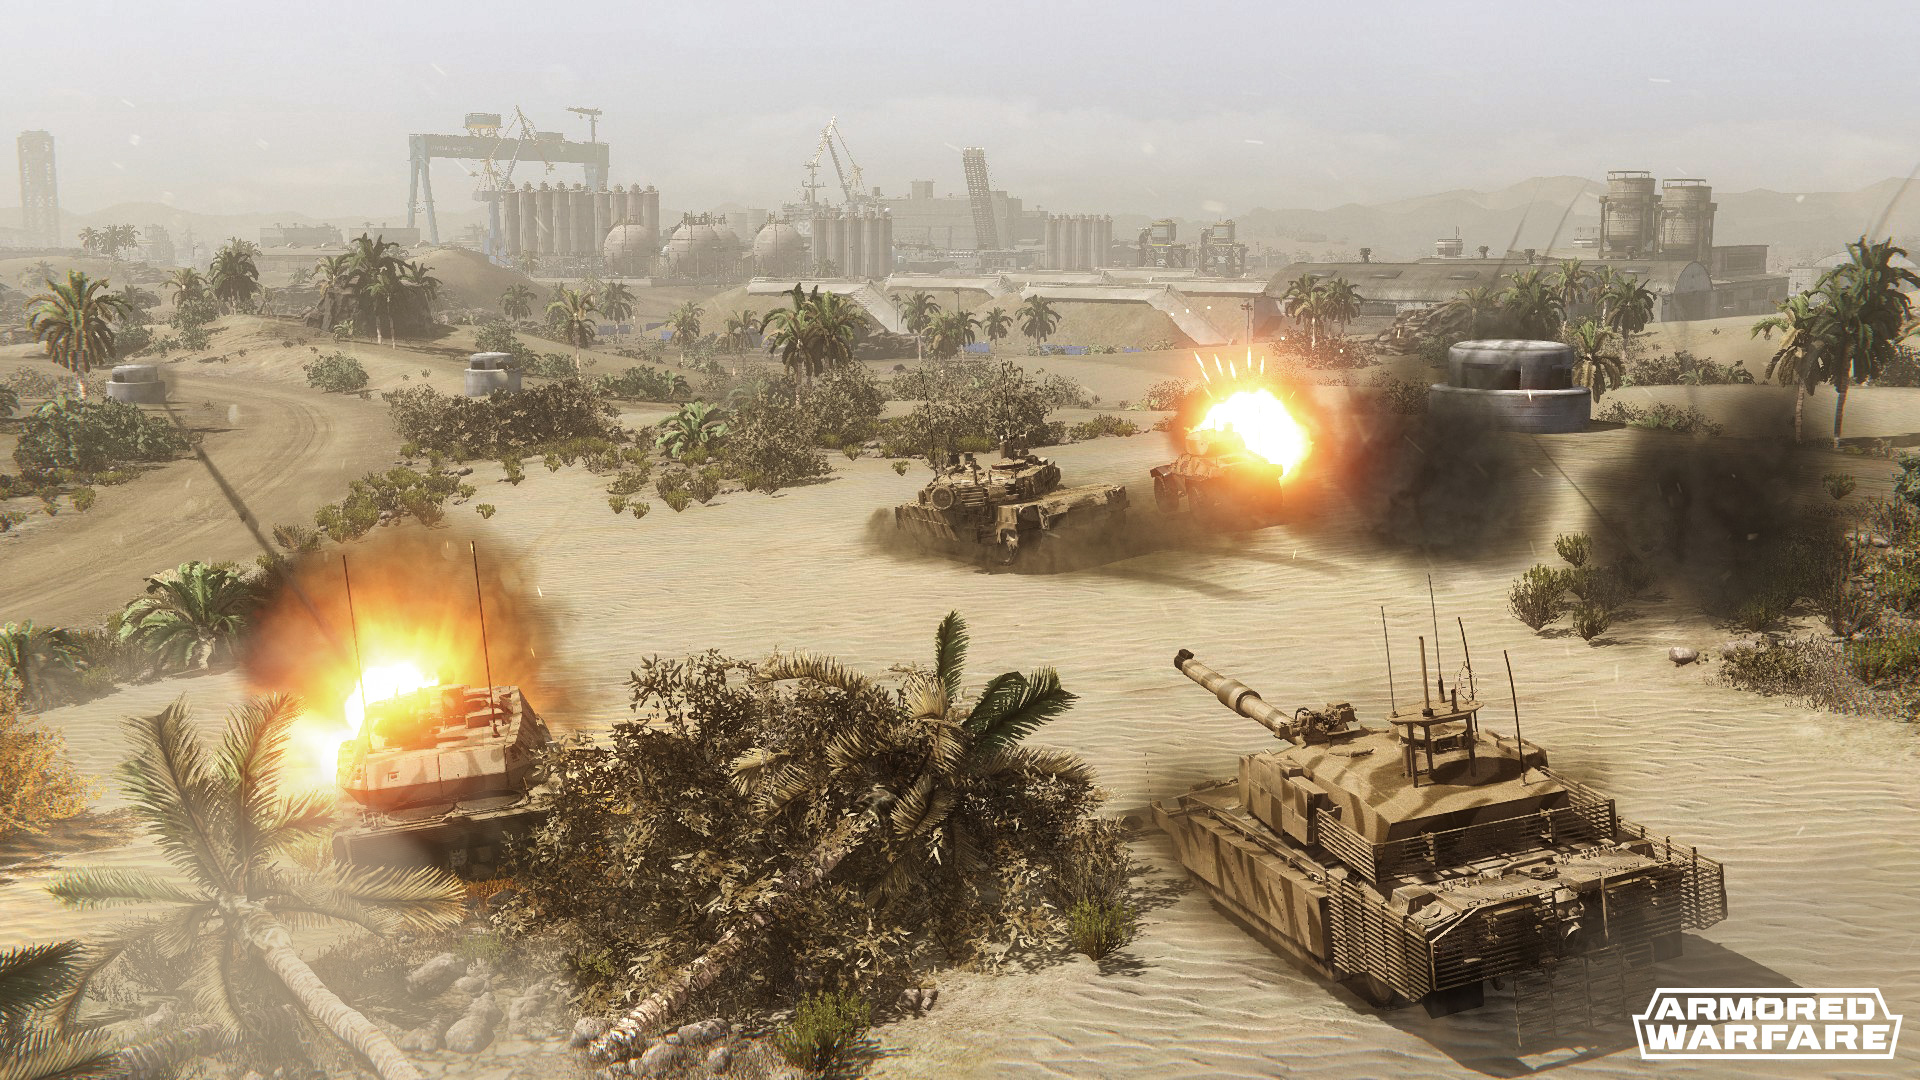 aarmored-warfare-global-operations05